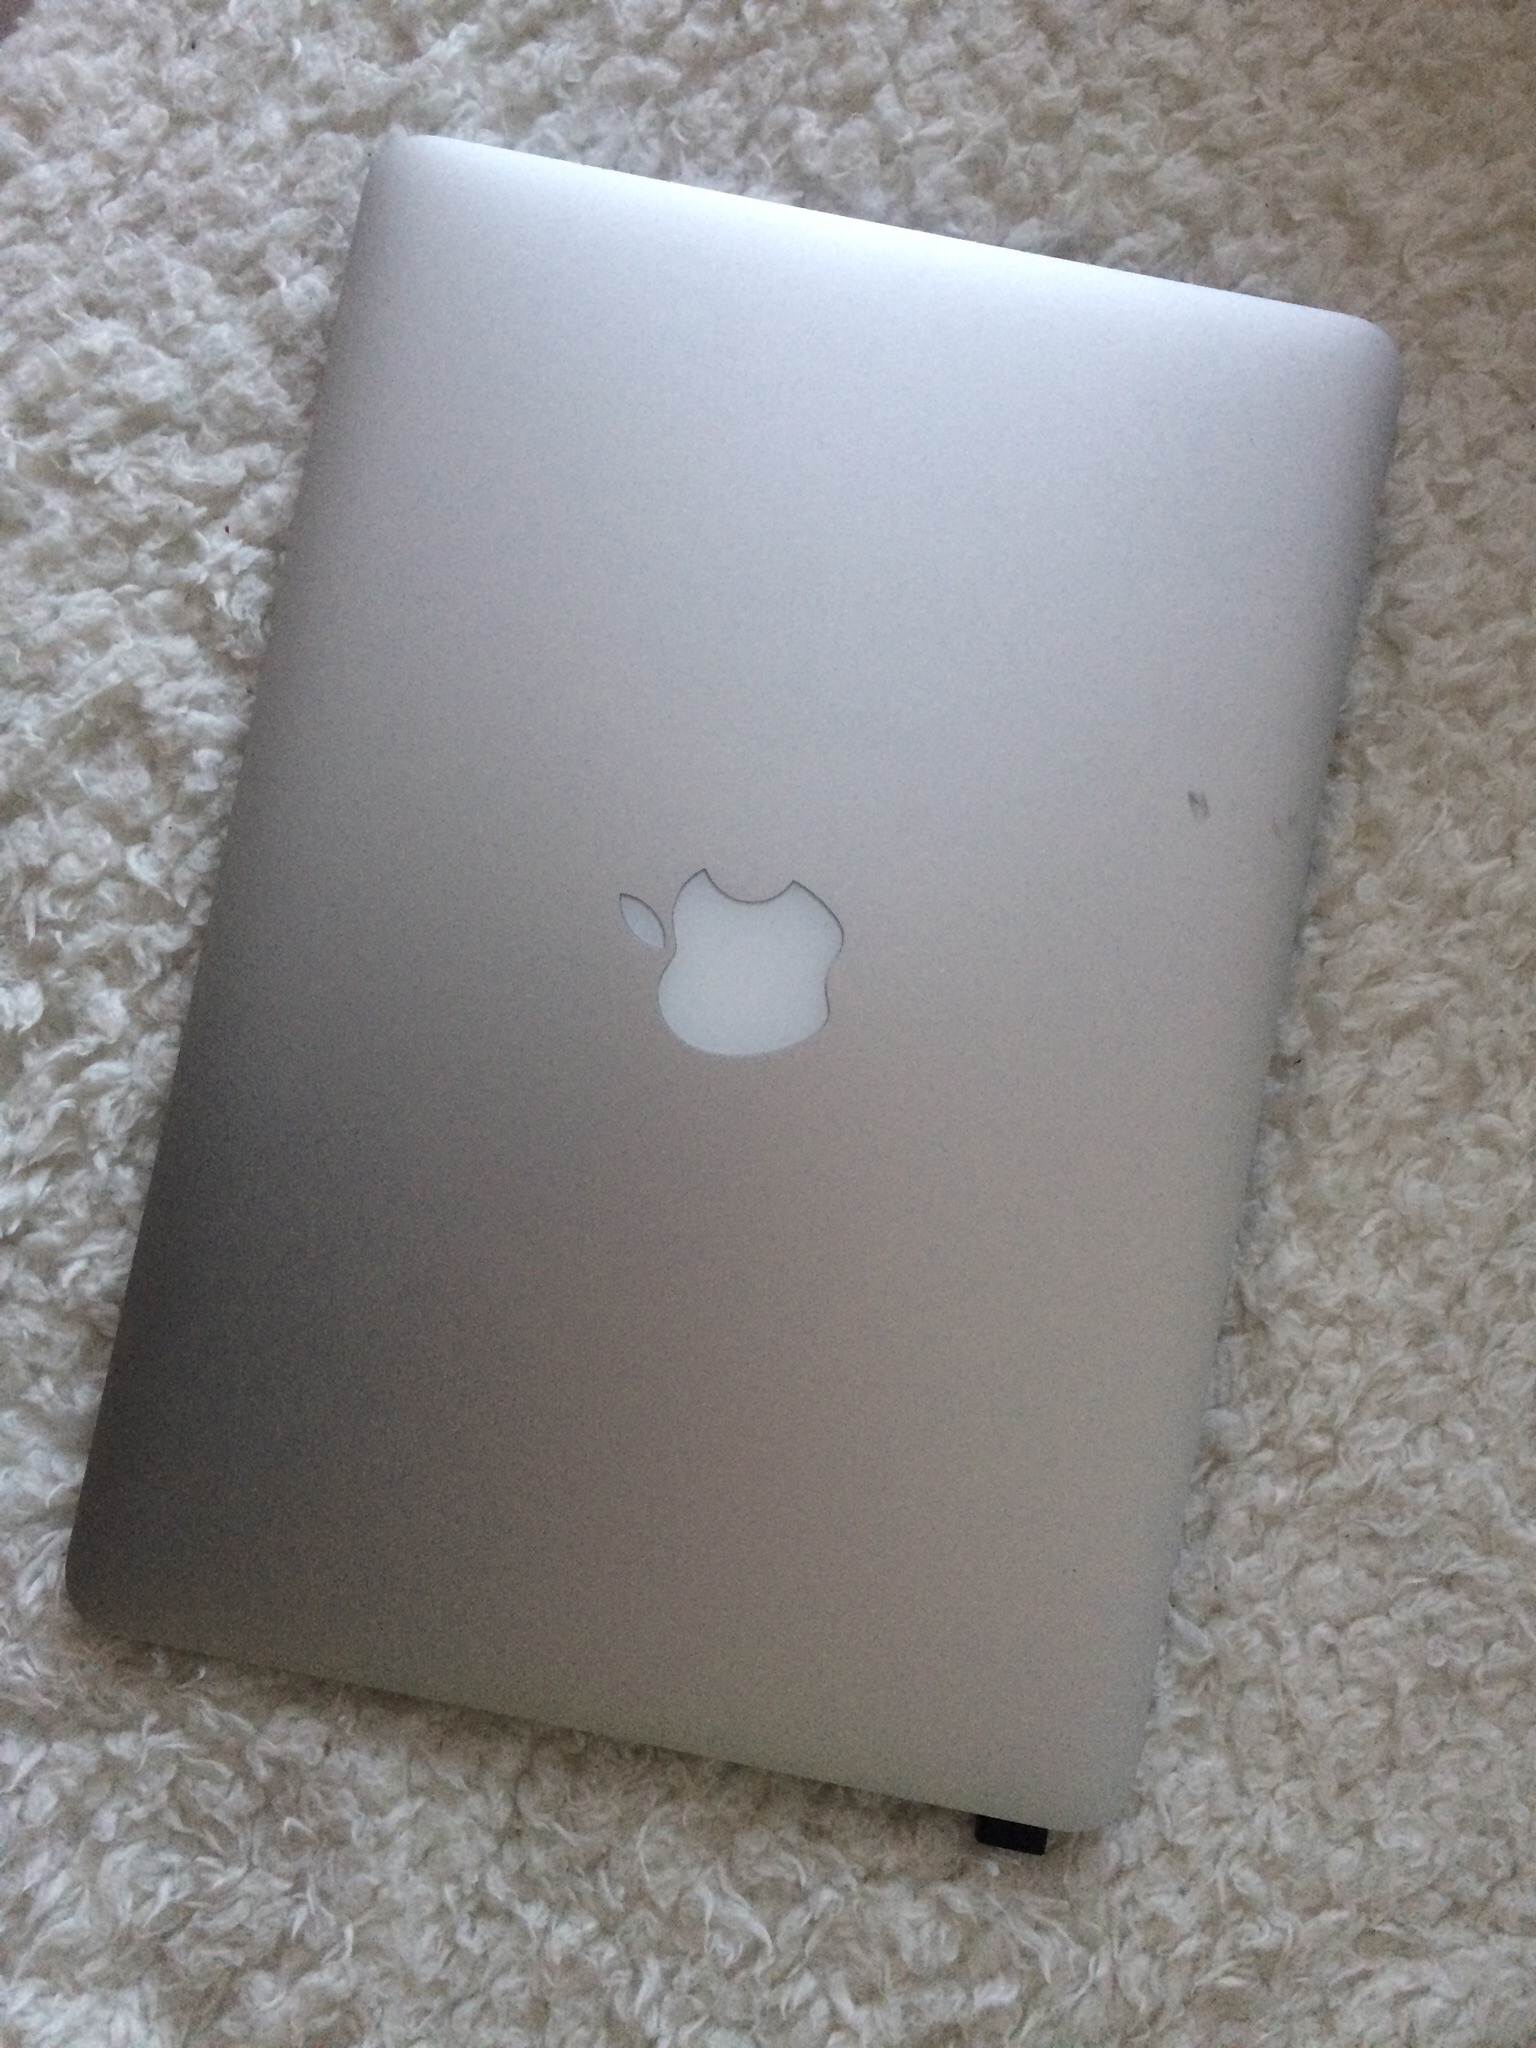 Продаю MacBook Pro 13″ (2015) 120 Гб